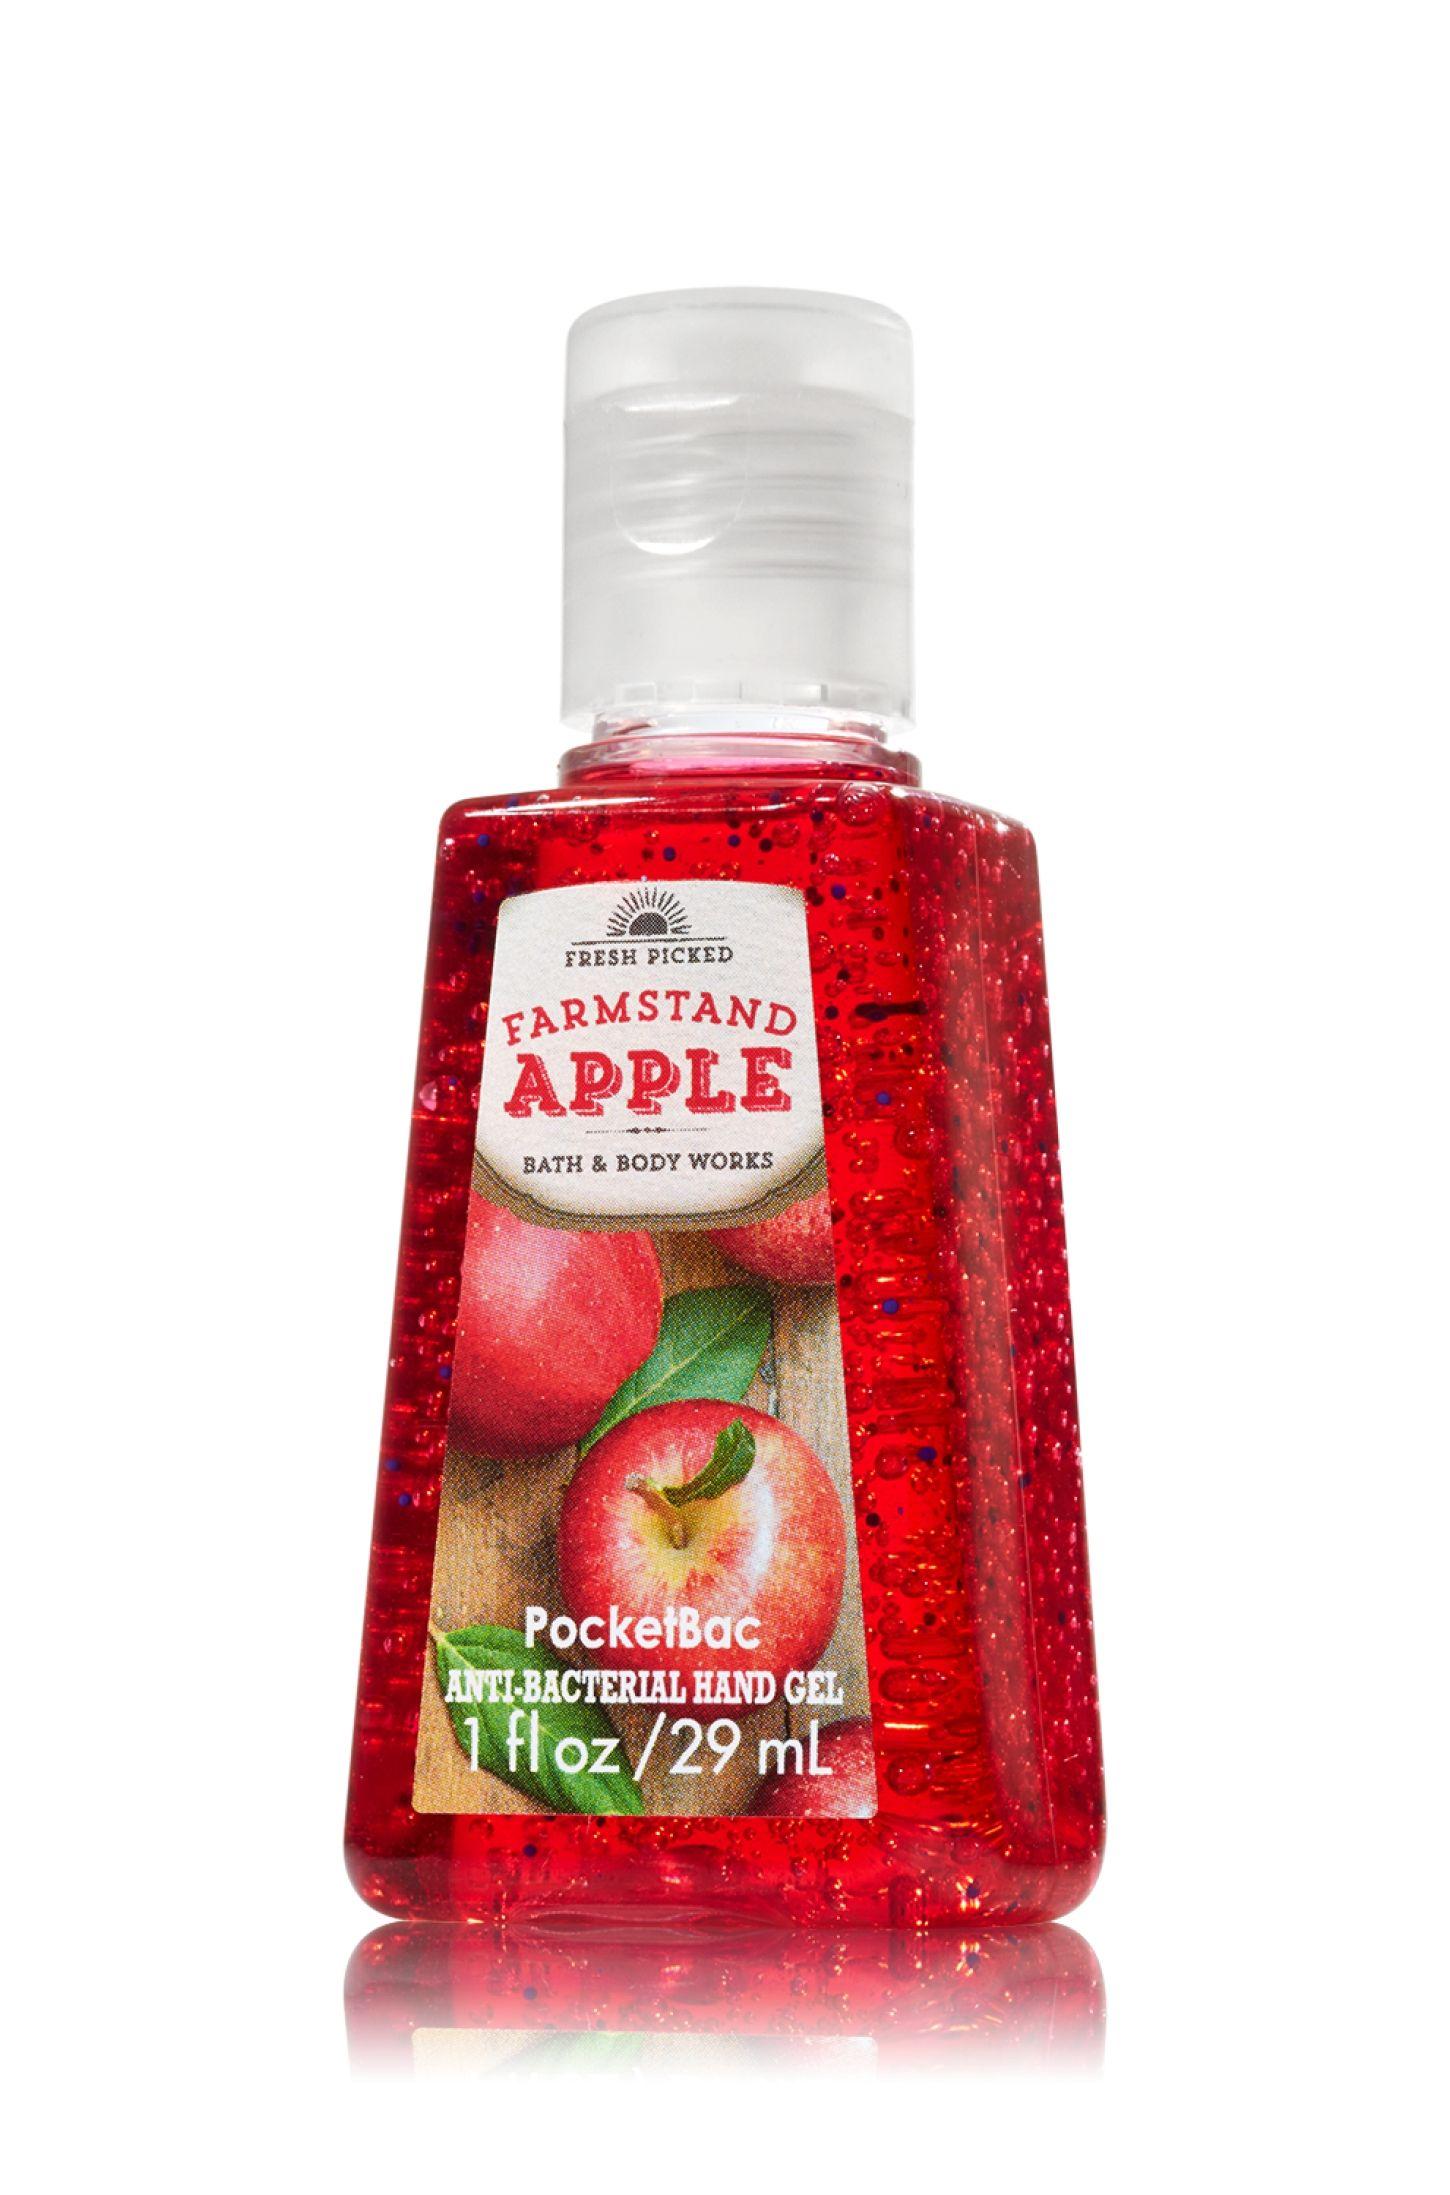 Farmstand Apple Pocketbac Sanitizing Hand Gel Soap Sanitizer